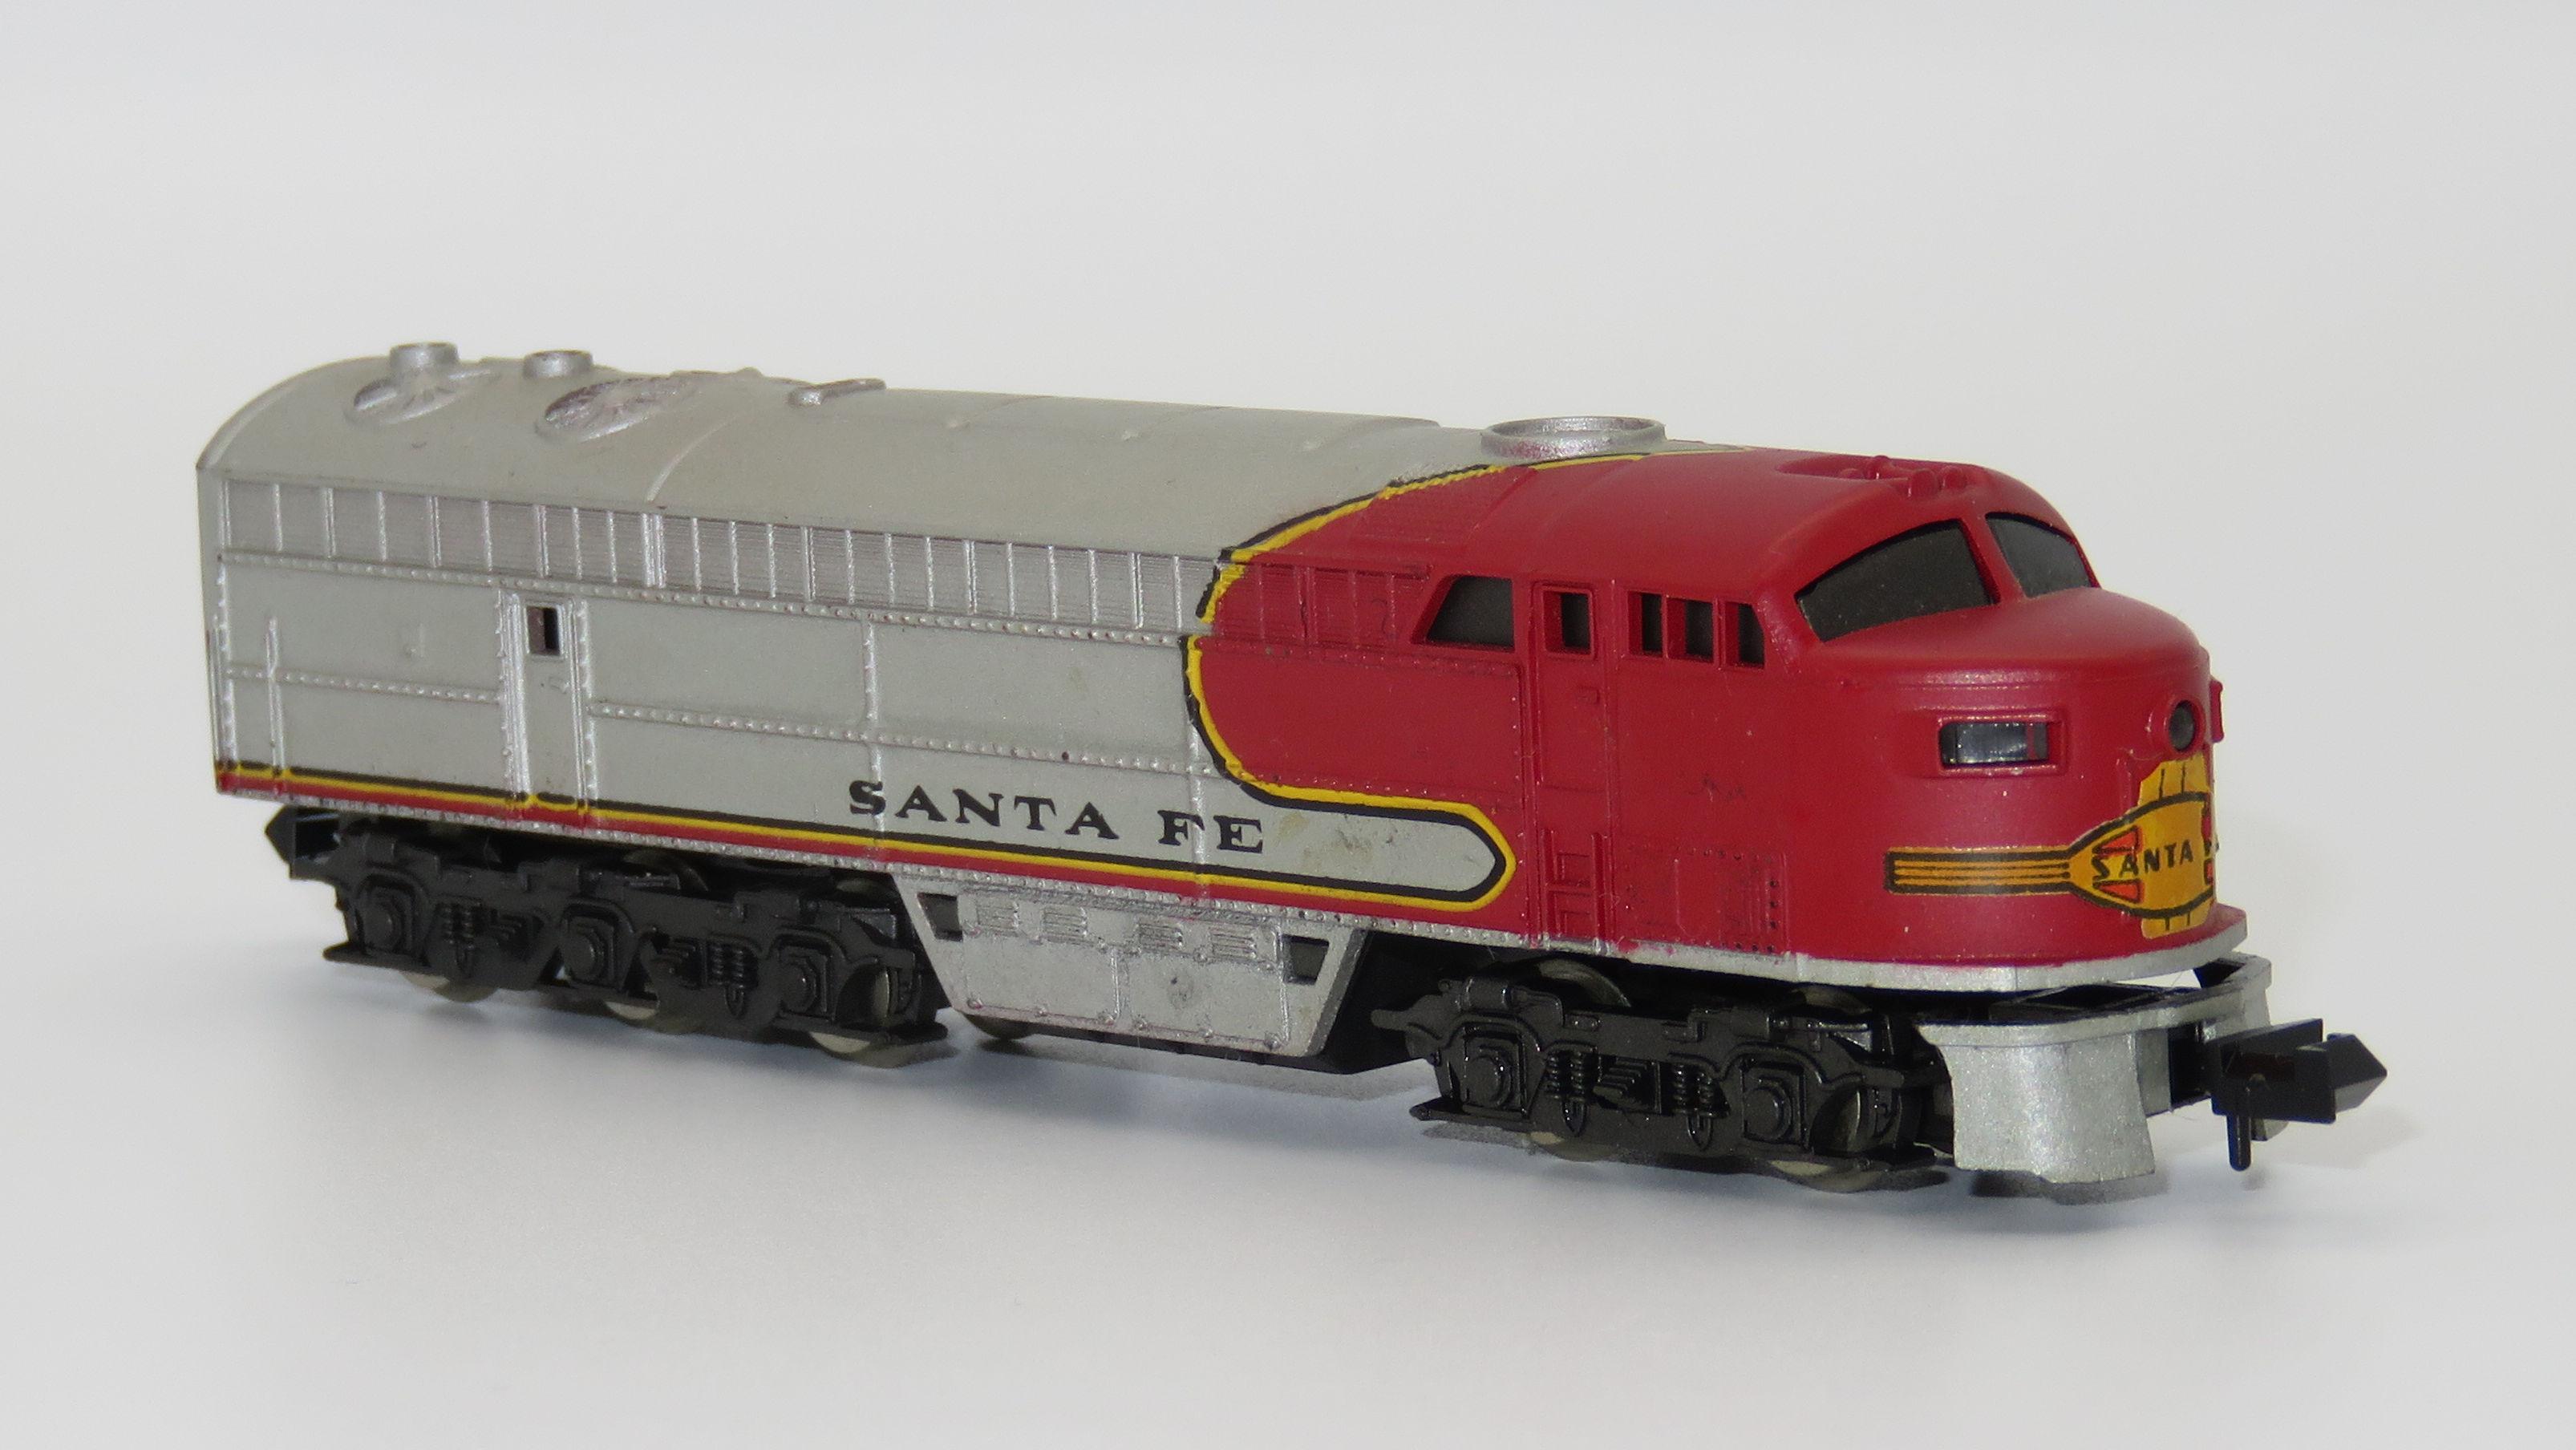 N Scale - Rivarossi - 9145 - Locomotive, Diesel, Fairbanks Morse, C-Liner - Santa Fe